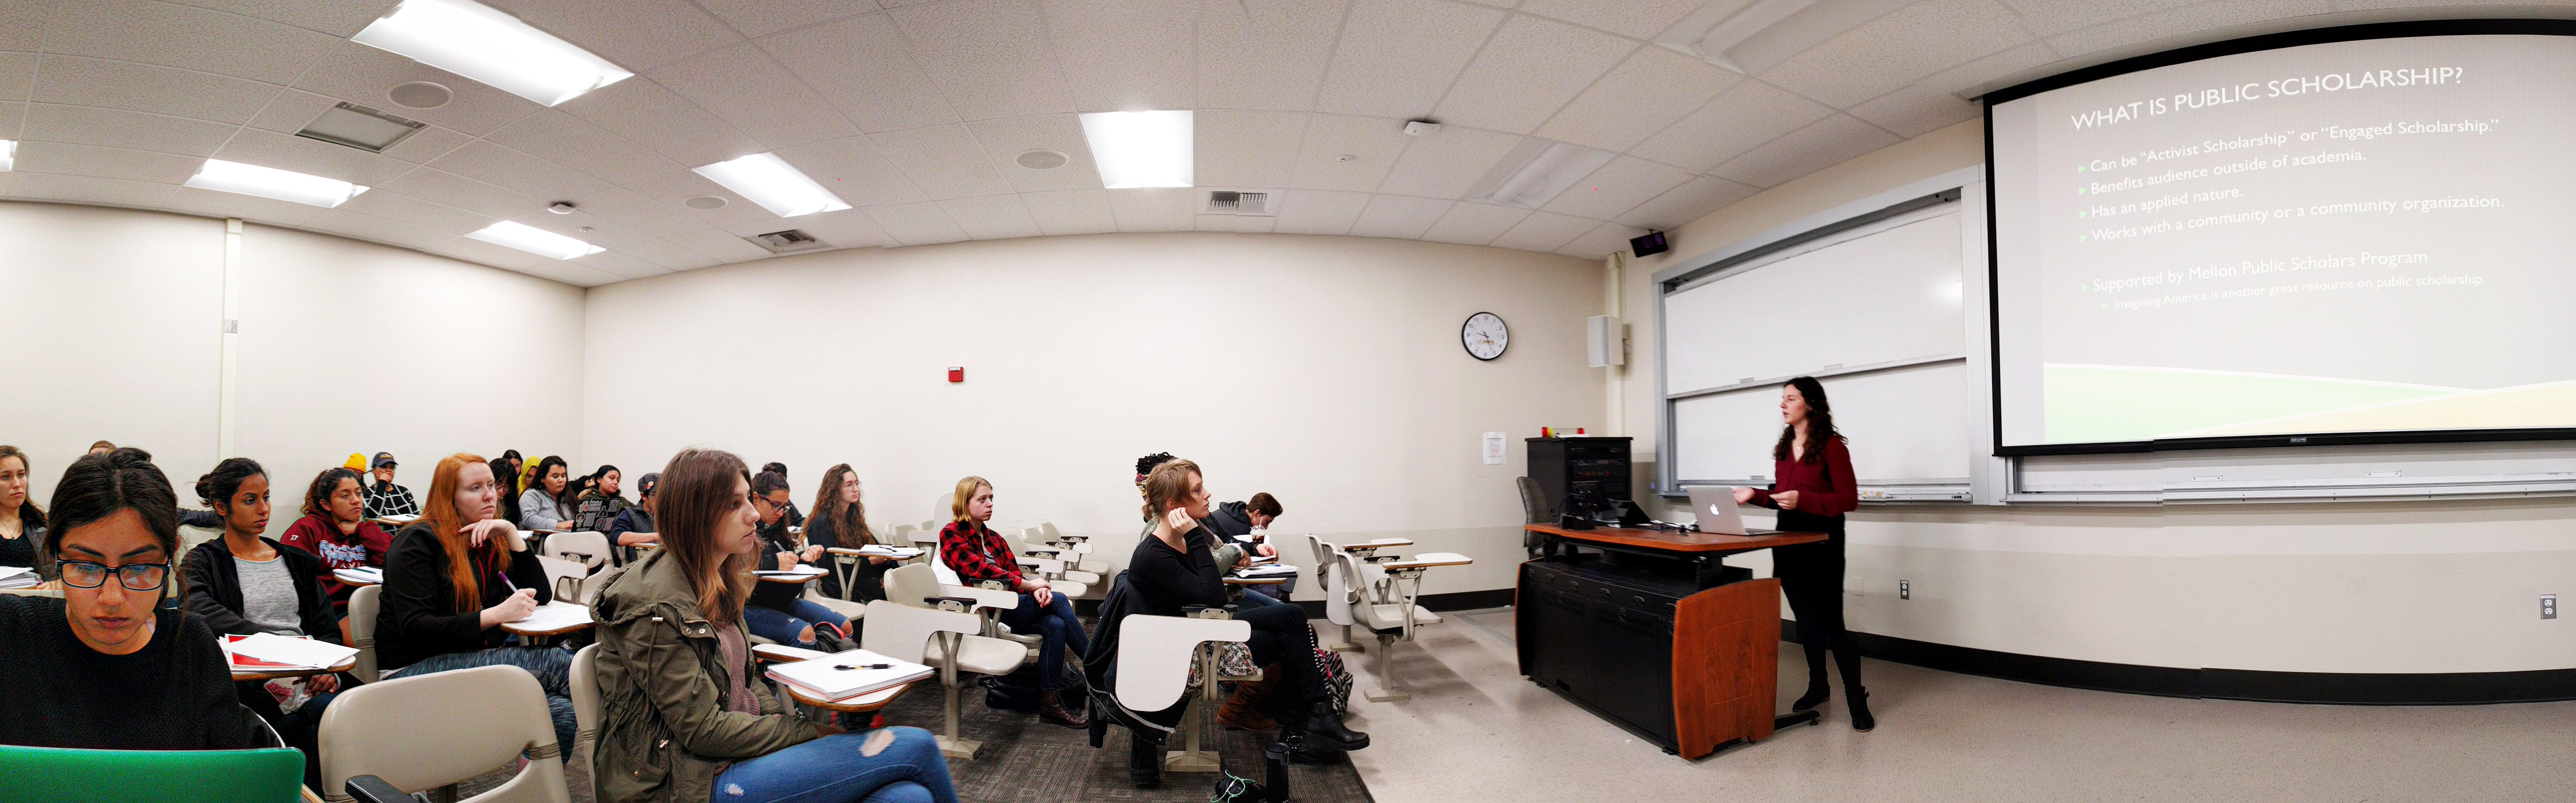 Alana Stein presents her Mellon Public Fellows Research, Jan 2018